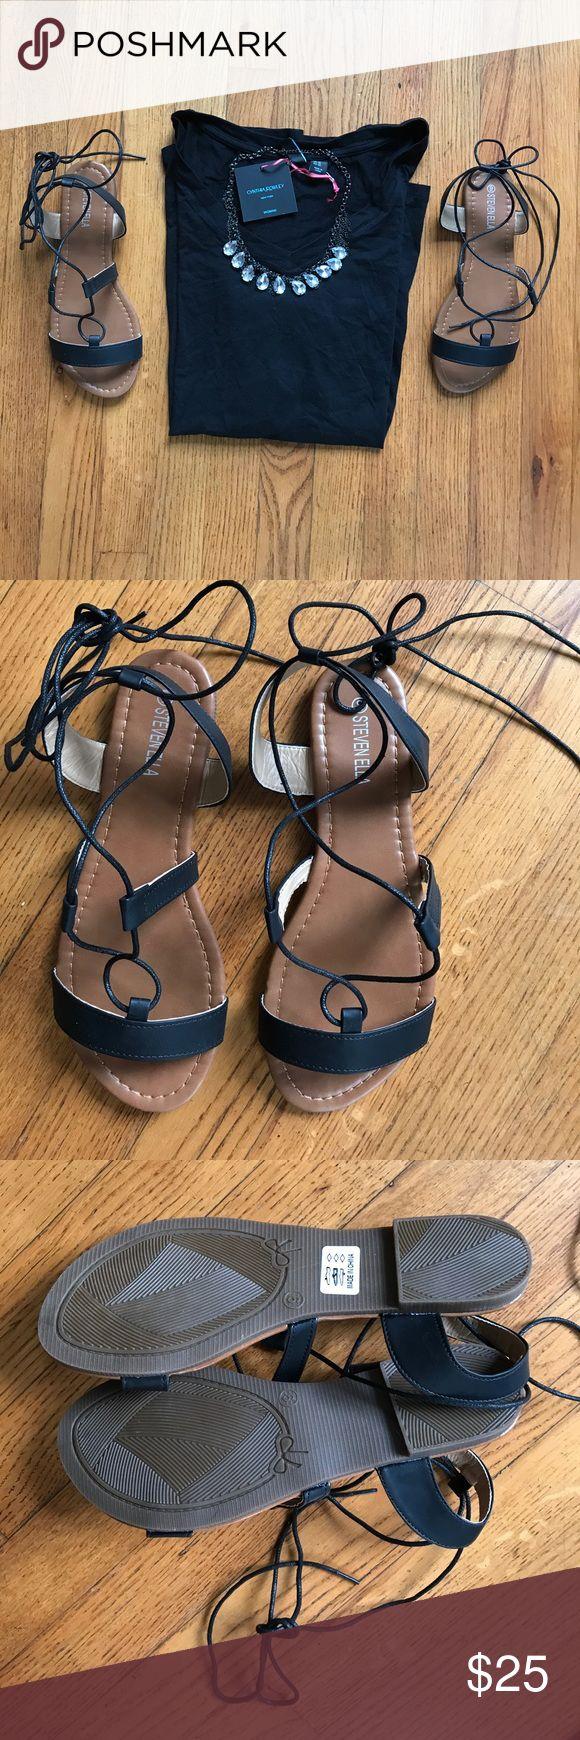 {Steven Ella} Criss-Cross Ankle-Strap Sandal [9] STEVEN ELLA INC. Black Criss-Cross Ankle-Strap Sandal. Size: 9. NWB❗️Never Worn. Bonus: Free w/ any $50.00 bundle purchase ❤️🙌🏻❗️($30.00 Value) Steven Ella Shoes Sandals